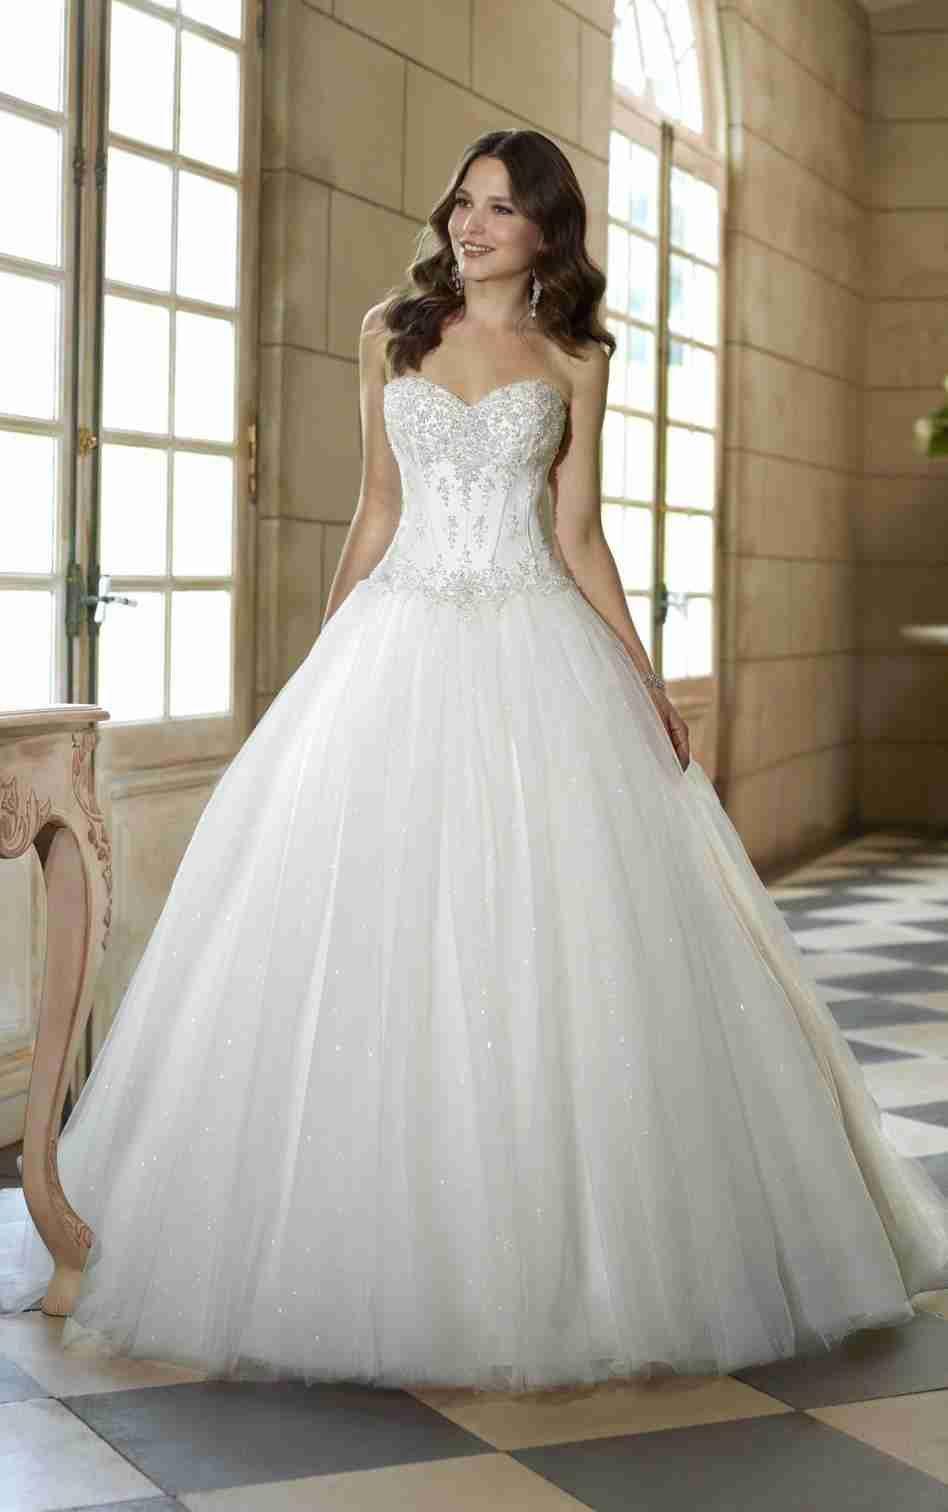 New Post lace princess wedding dresses tumblr | Weddings | Pinterest ...